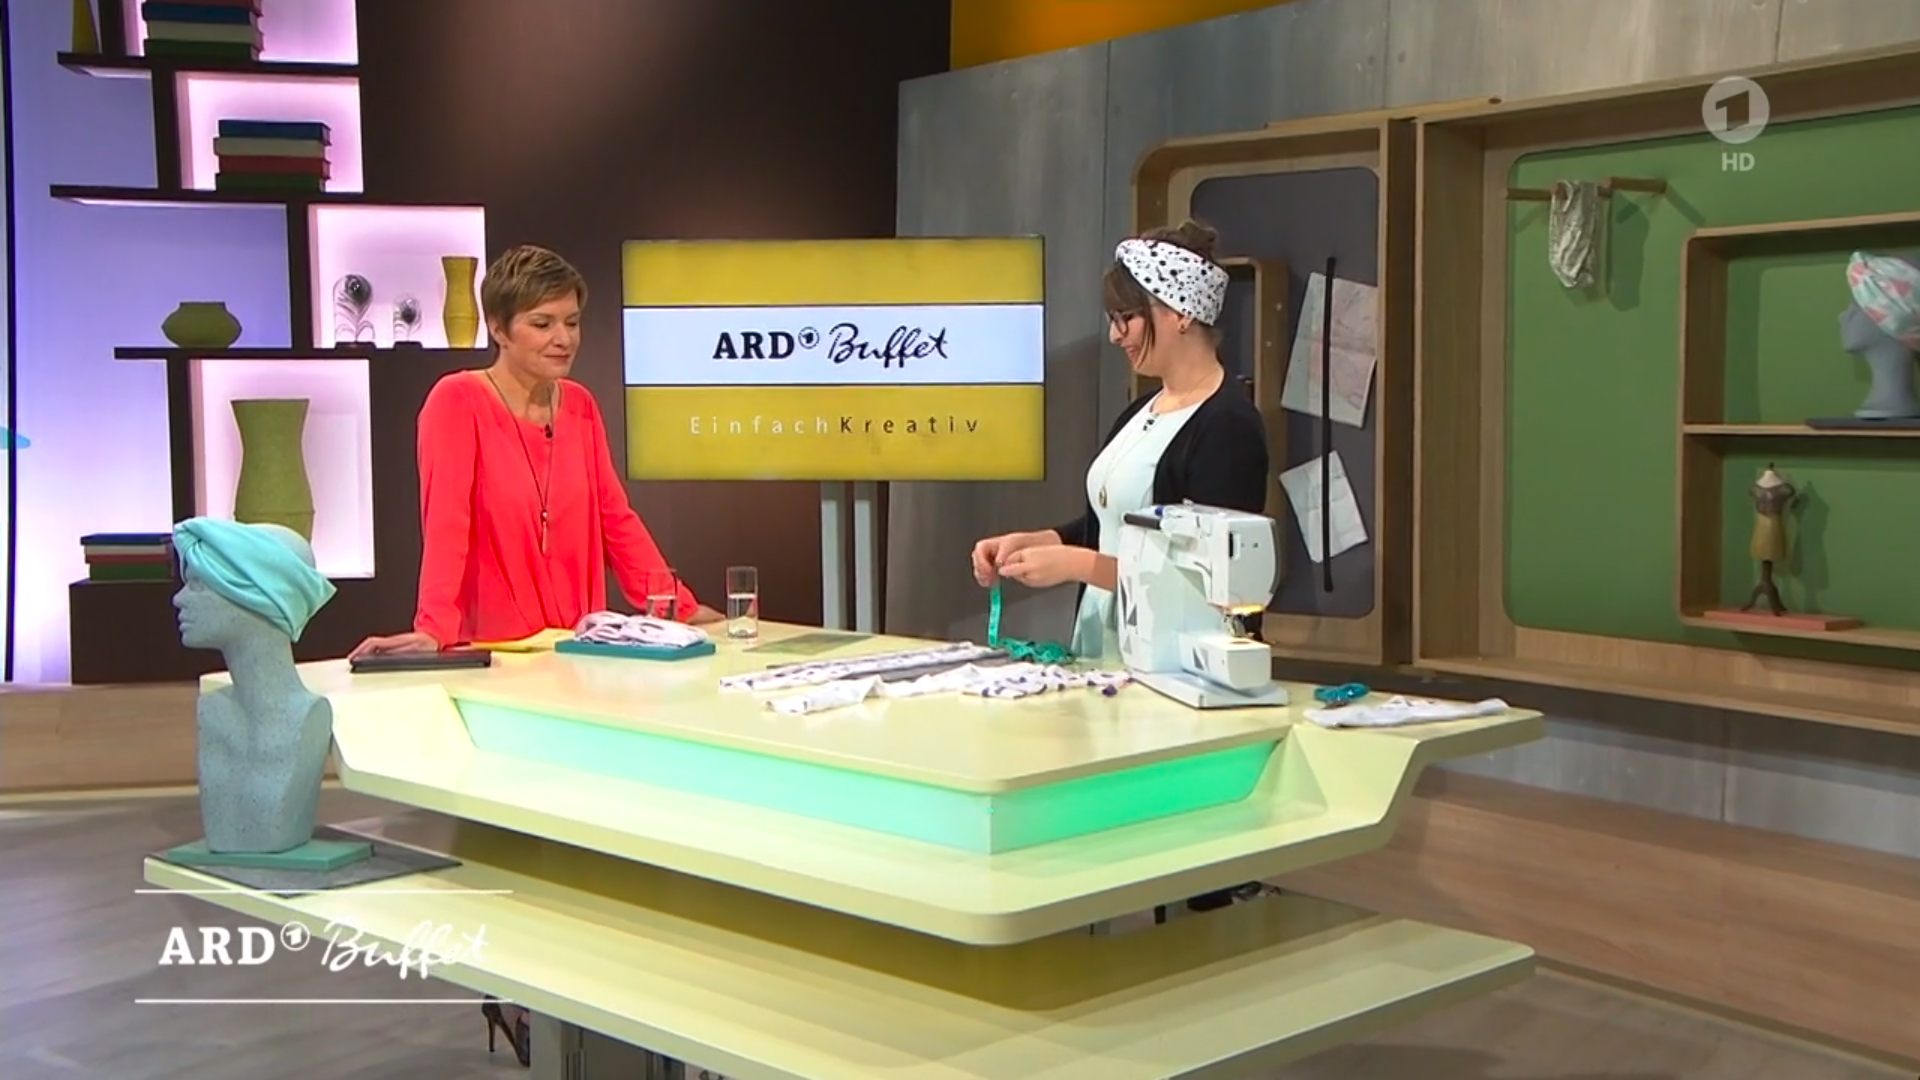 DIY: Turban-Stirnband nähen   ARD-Buffet   mein feenstaub